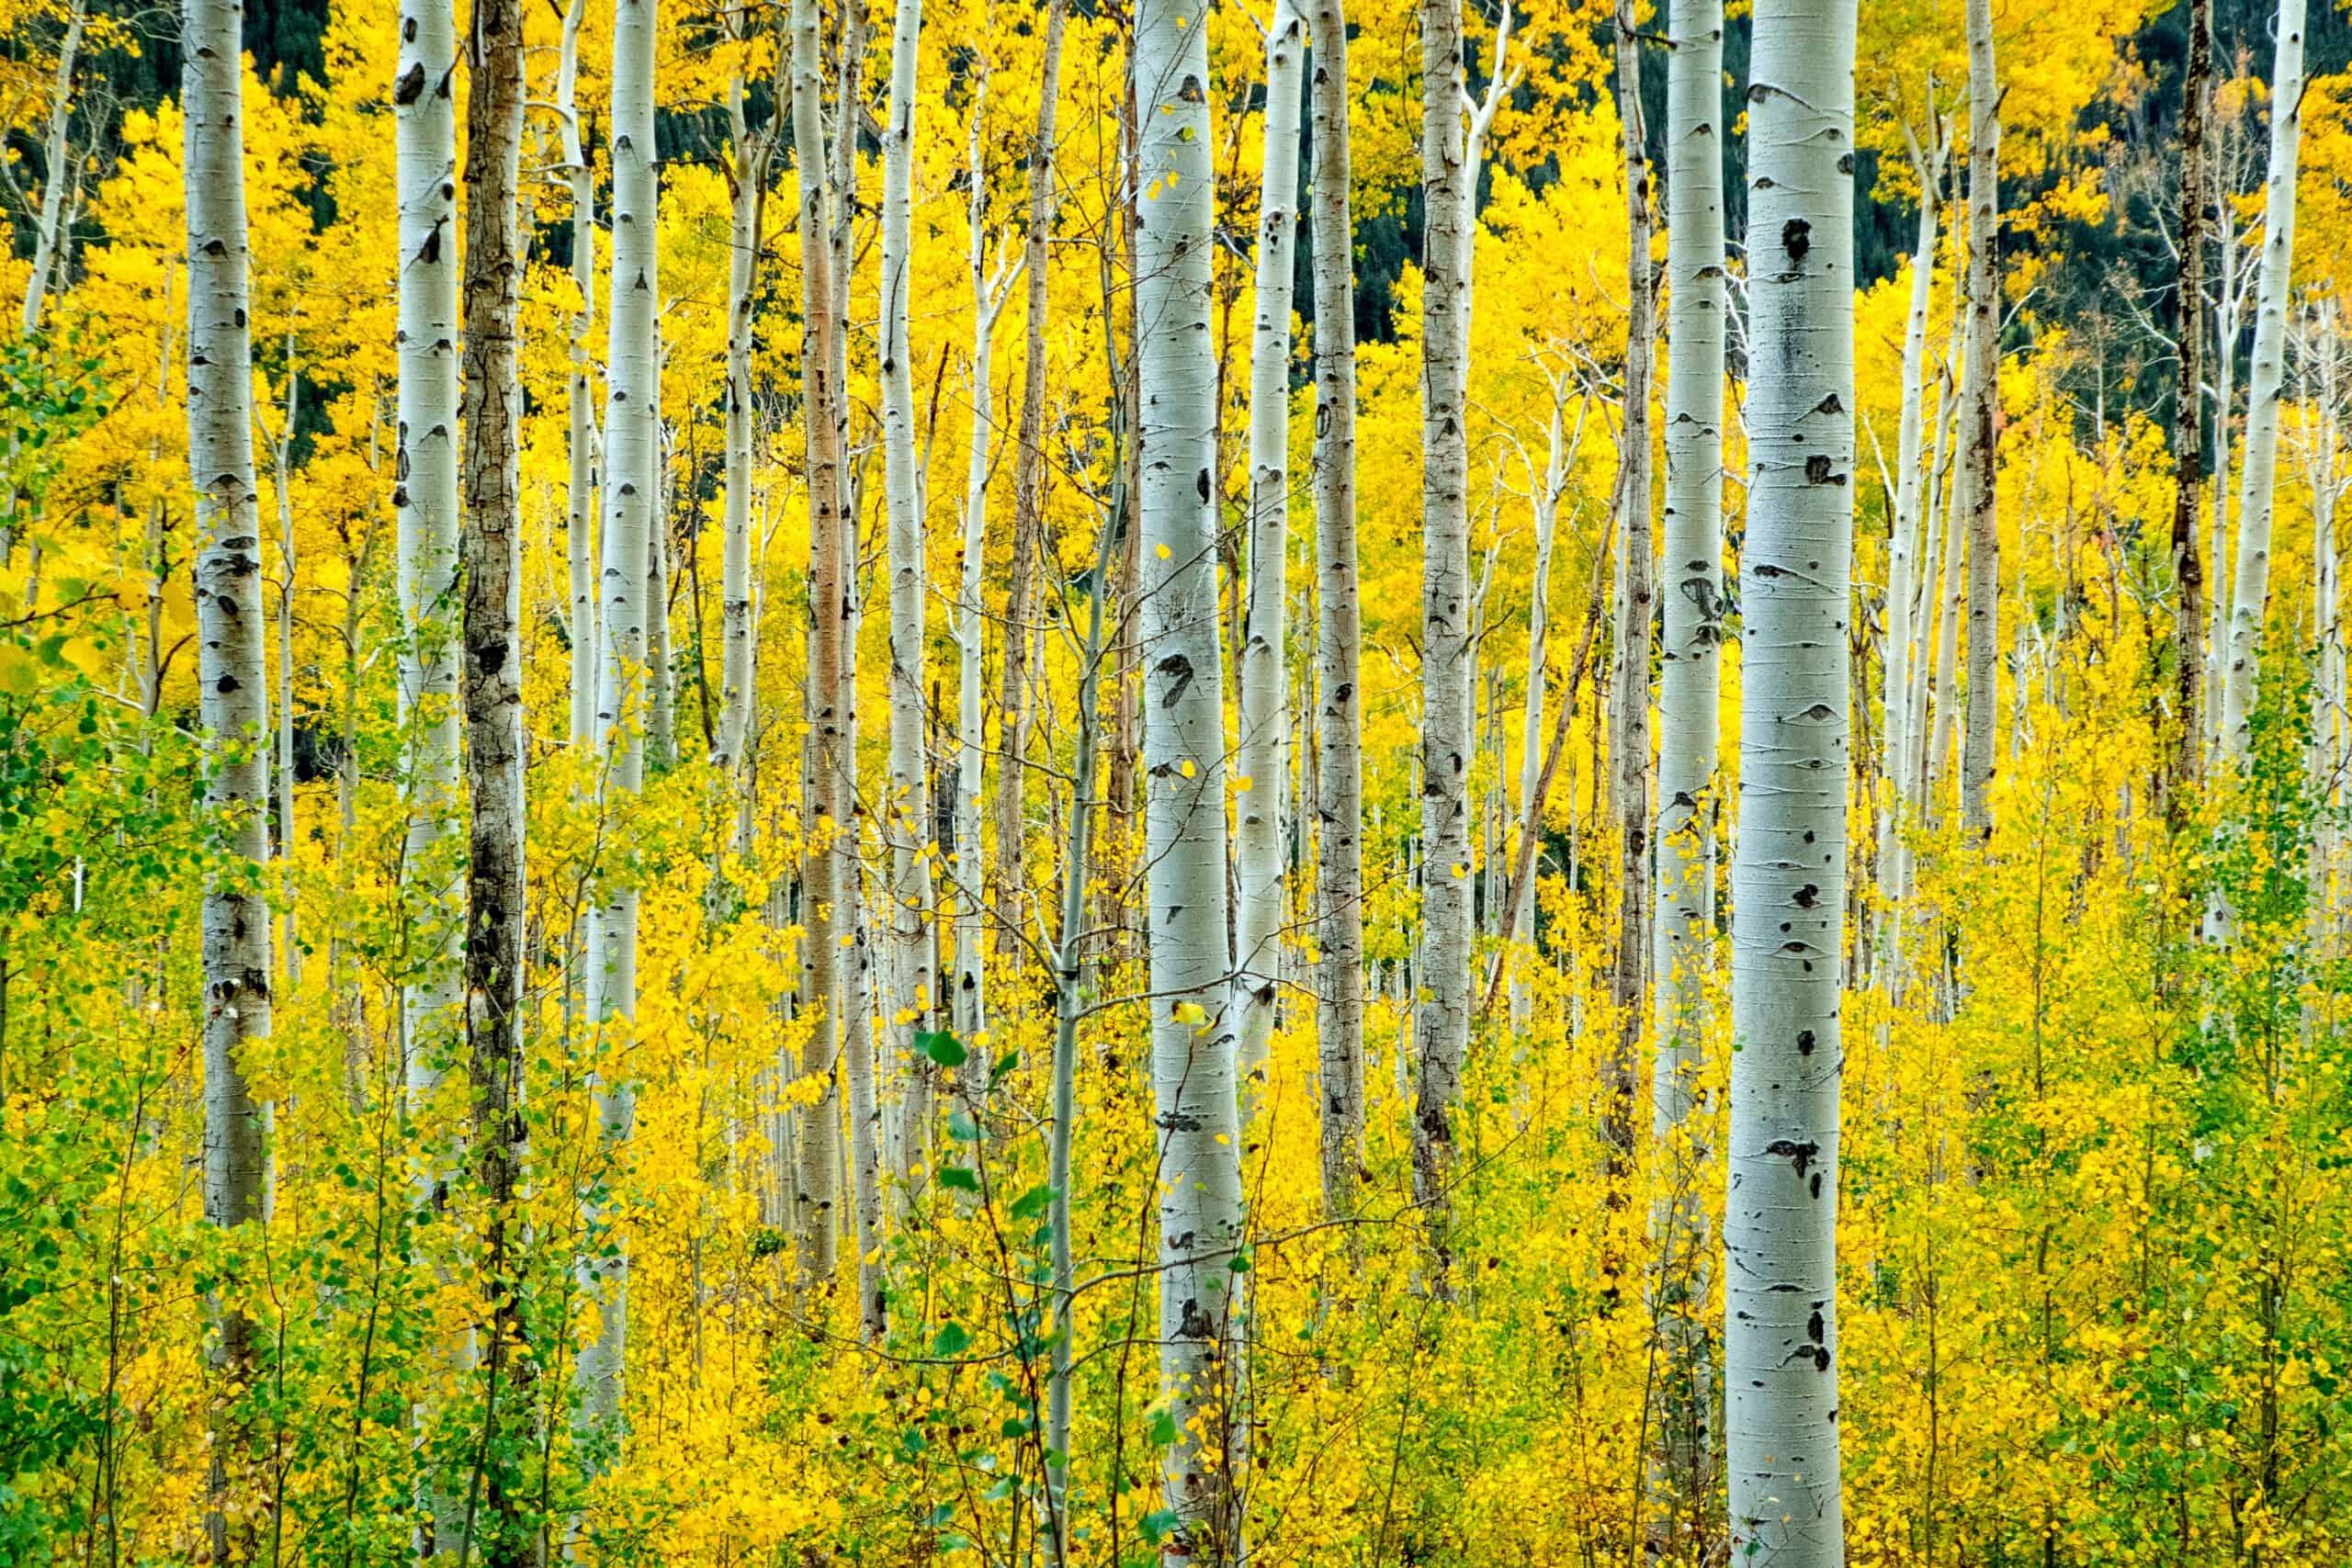 Birch Tree Treatment